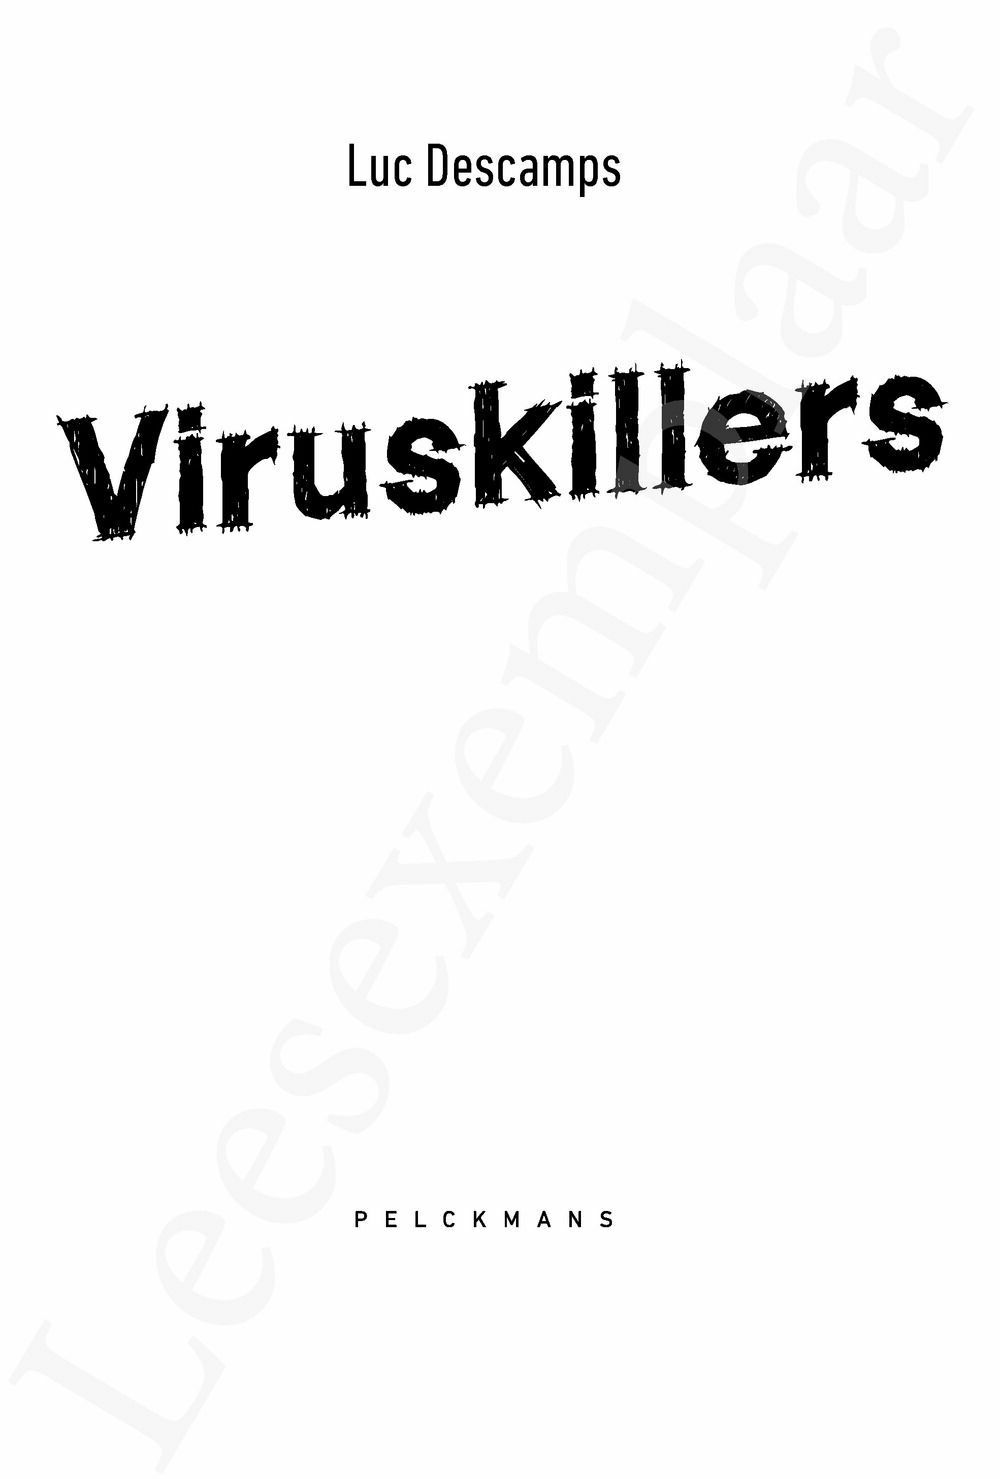 Preview: Viruskillers